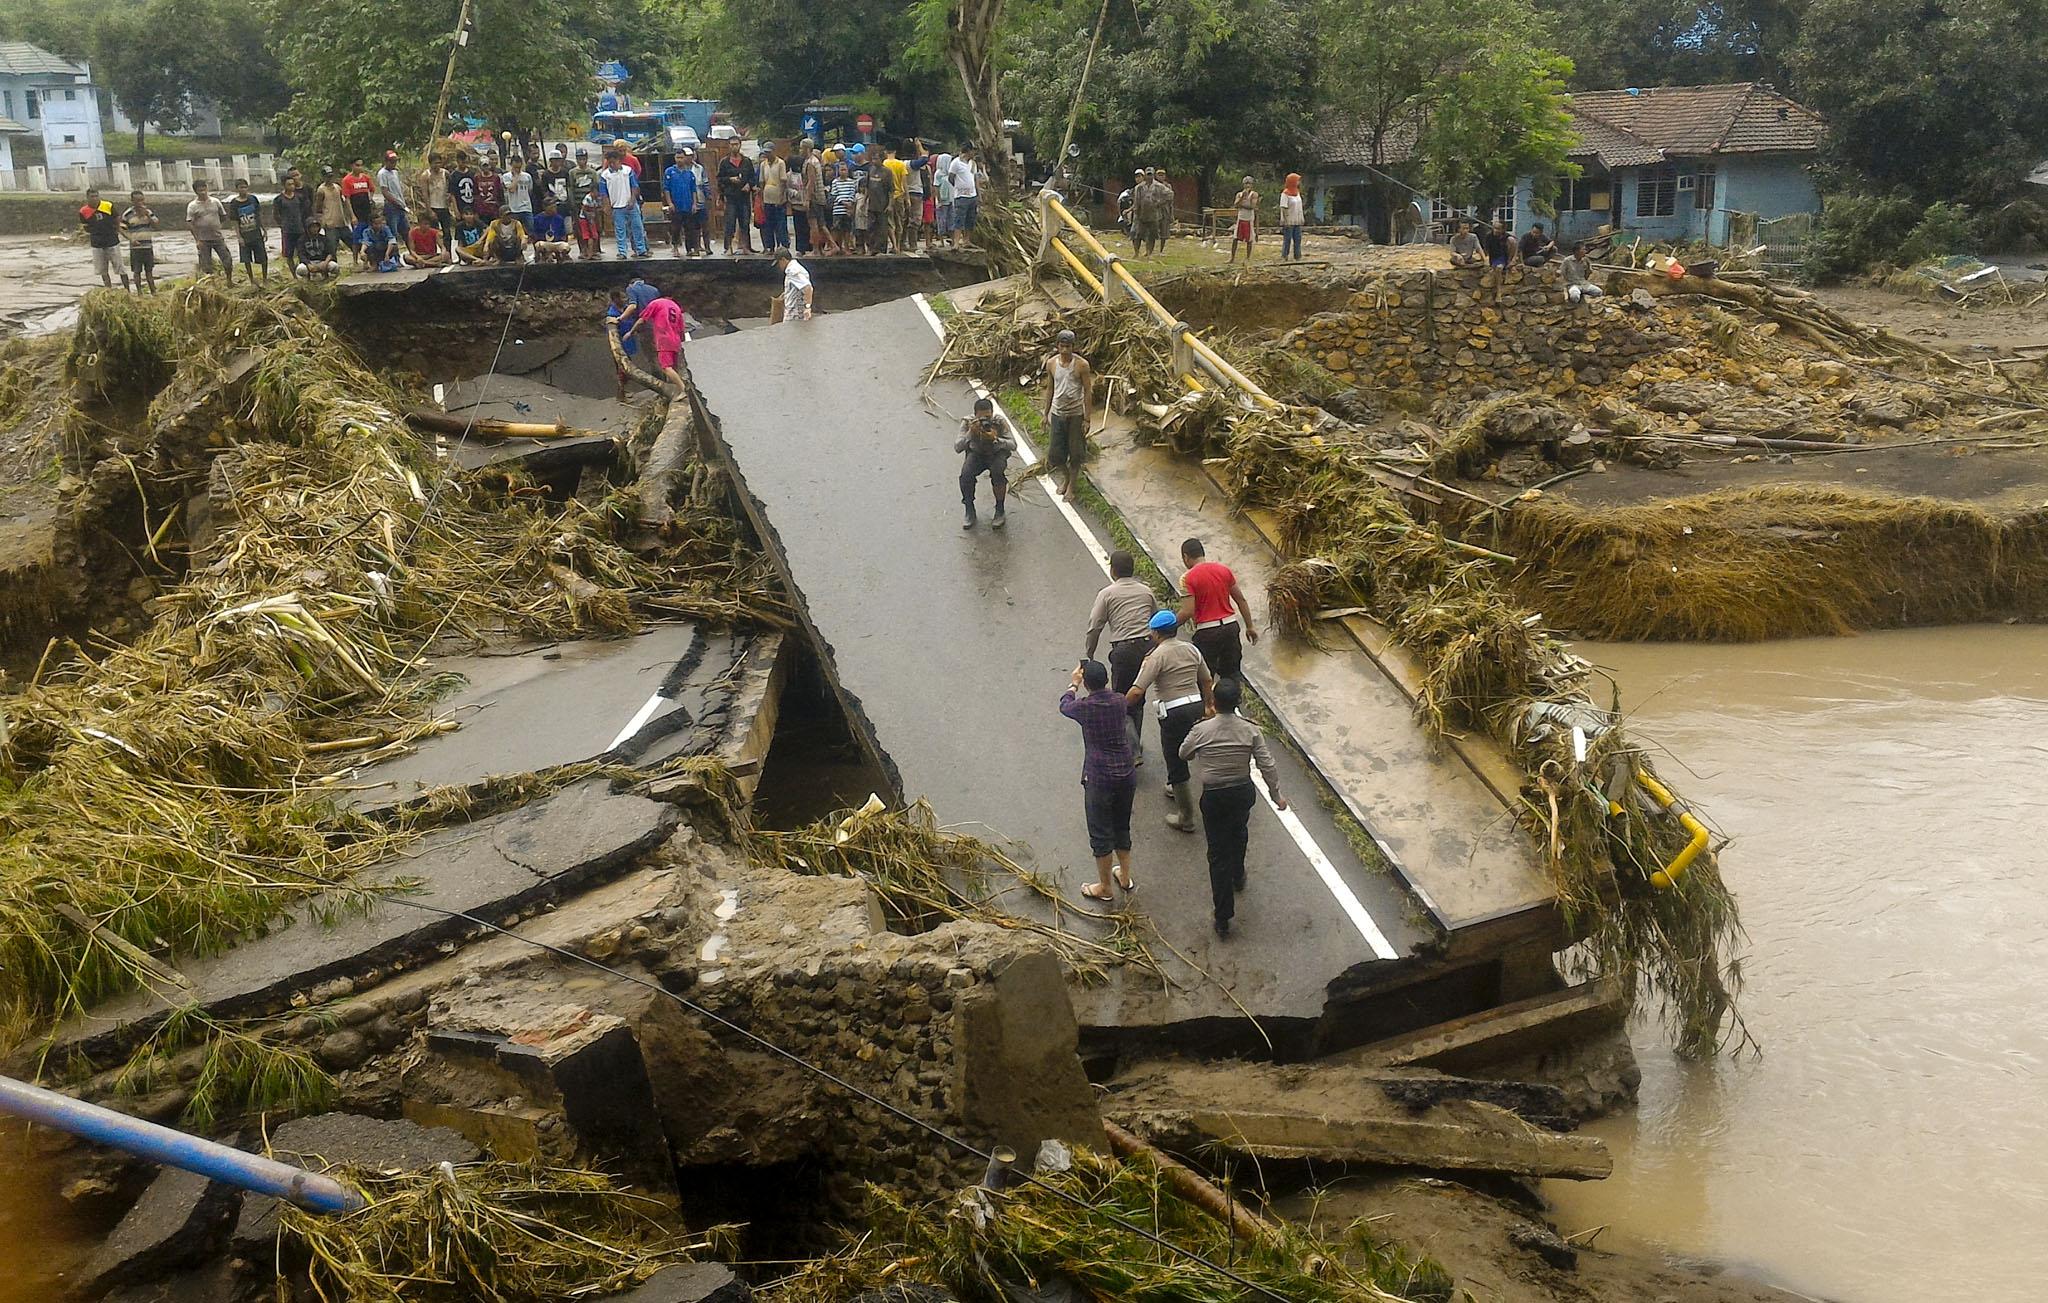 Warga berada dekat jembatan yang ambruk diterjang banjir di Kelurahan Kodo, Kecamatan Rasana'e Timur, Kota Bima, NTB, Kamis (22/12/2016). Banjir yang terjadi akibat meluapnya air sungai Padolo ini melumpuhkan seluruh aktifitas warga di Bima. (JIBI/Solopos/Antara/Didin)